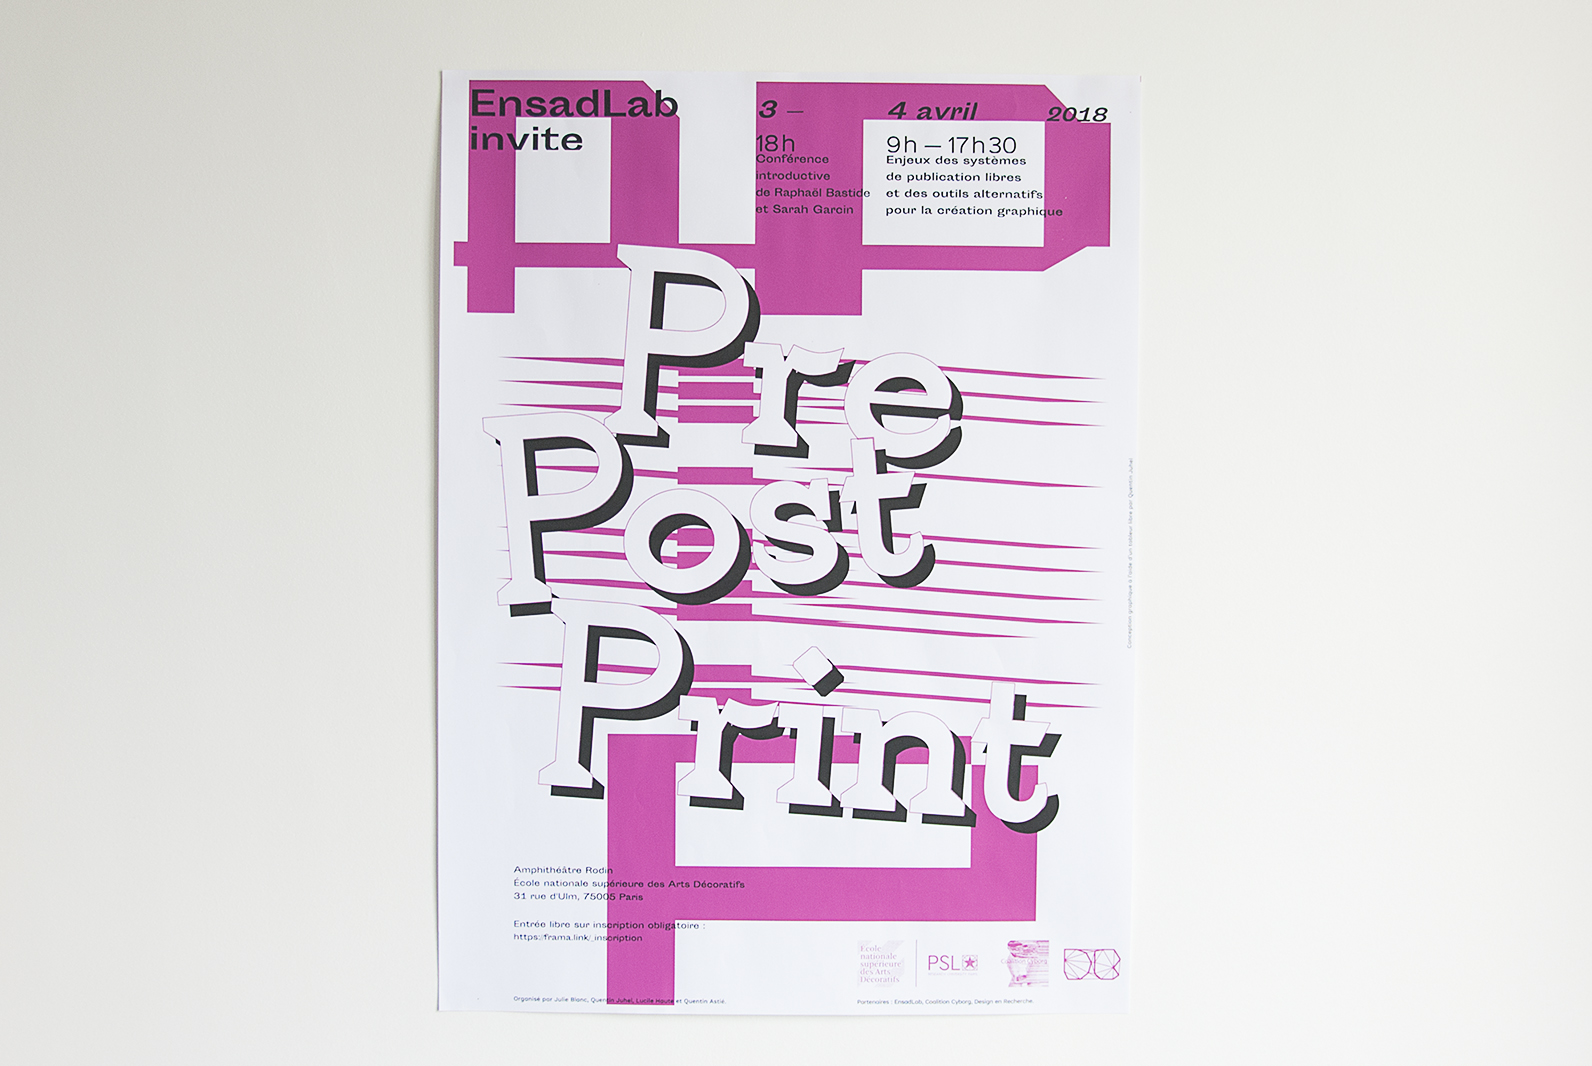 Poster EnsadLab invite PrePostPrint